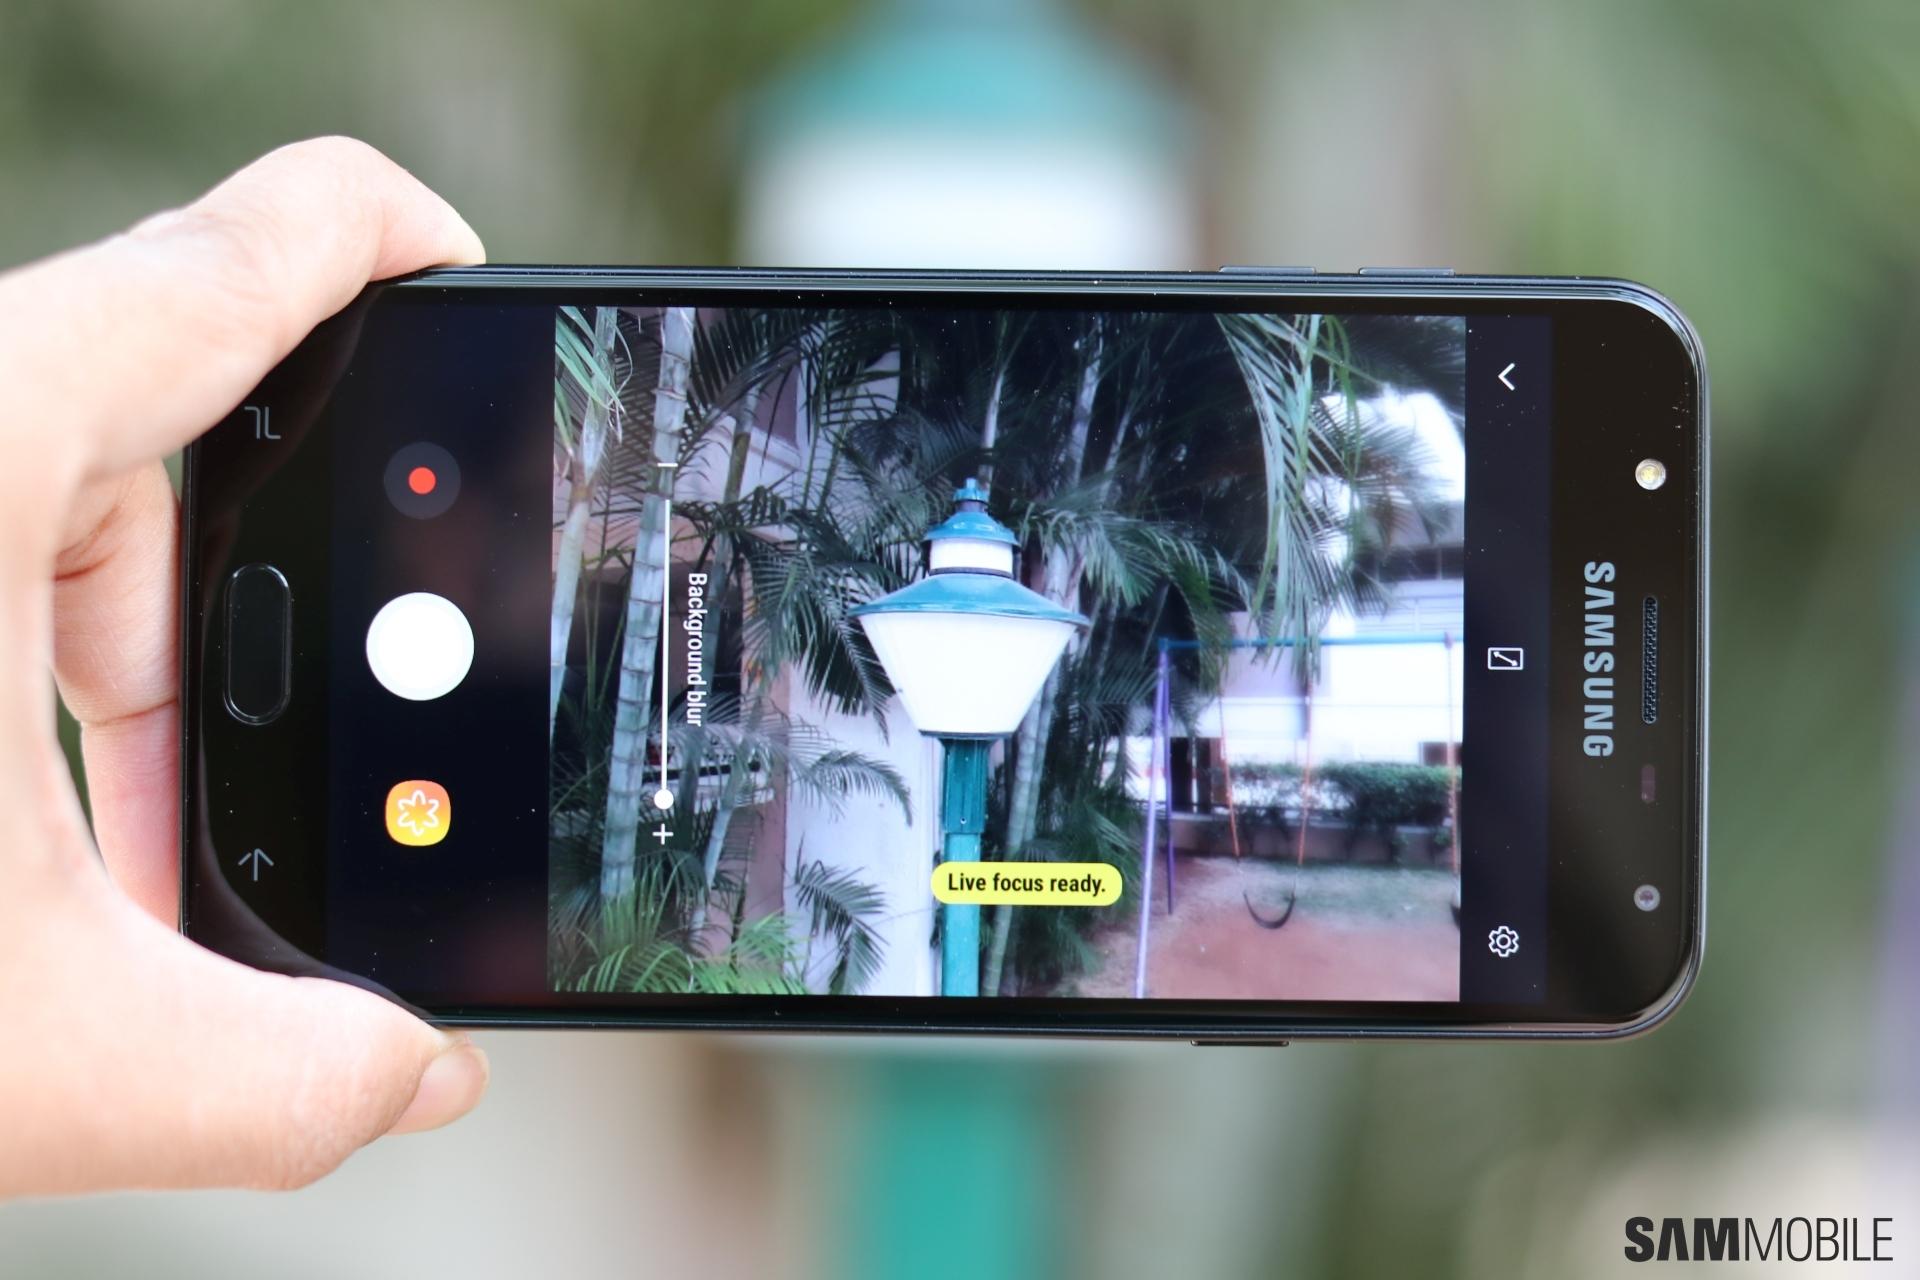 Galaxy J7 Duo update introduces AR Emoji to Samsung's budget lineup